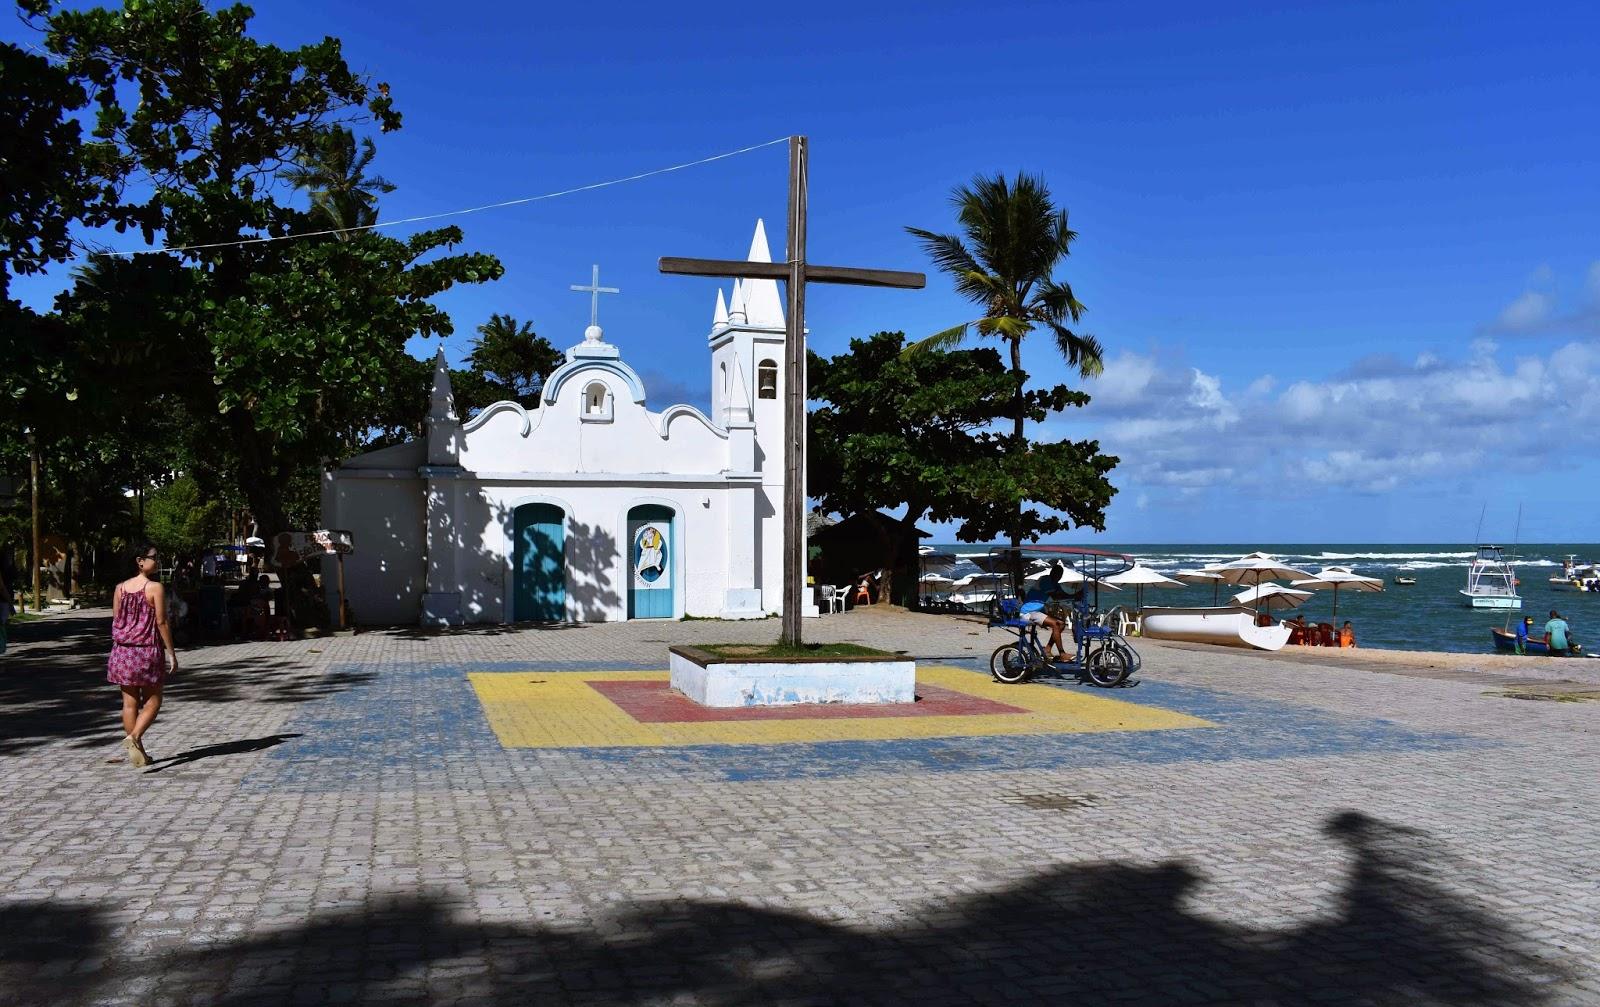 Bate e Volta de Salvador a Praia do Forte